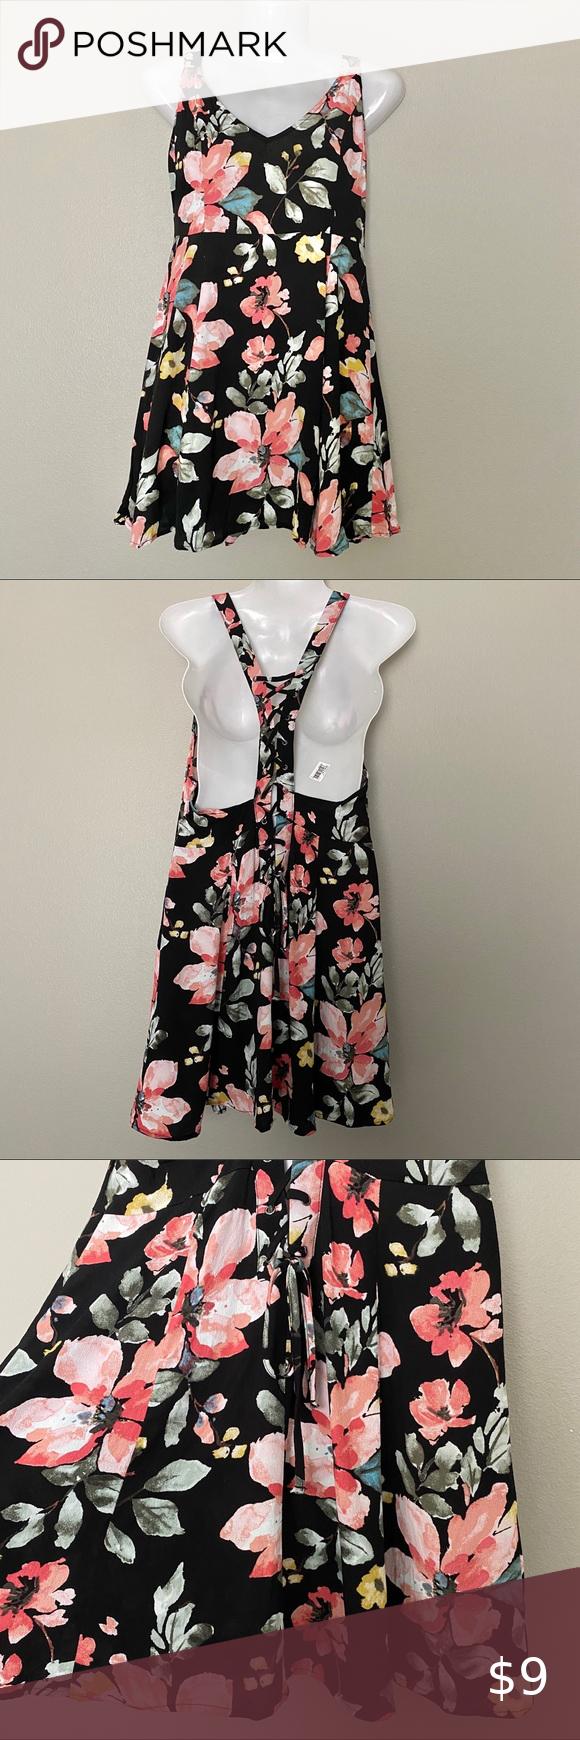 Forever 21 Black Pink Floral Sleeveless Dress Beautiful Black Dresses Sleeveless Floral Dress Floral Dress Black [ 1740 x 580 Pixel ]